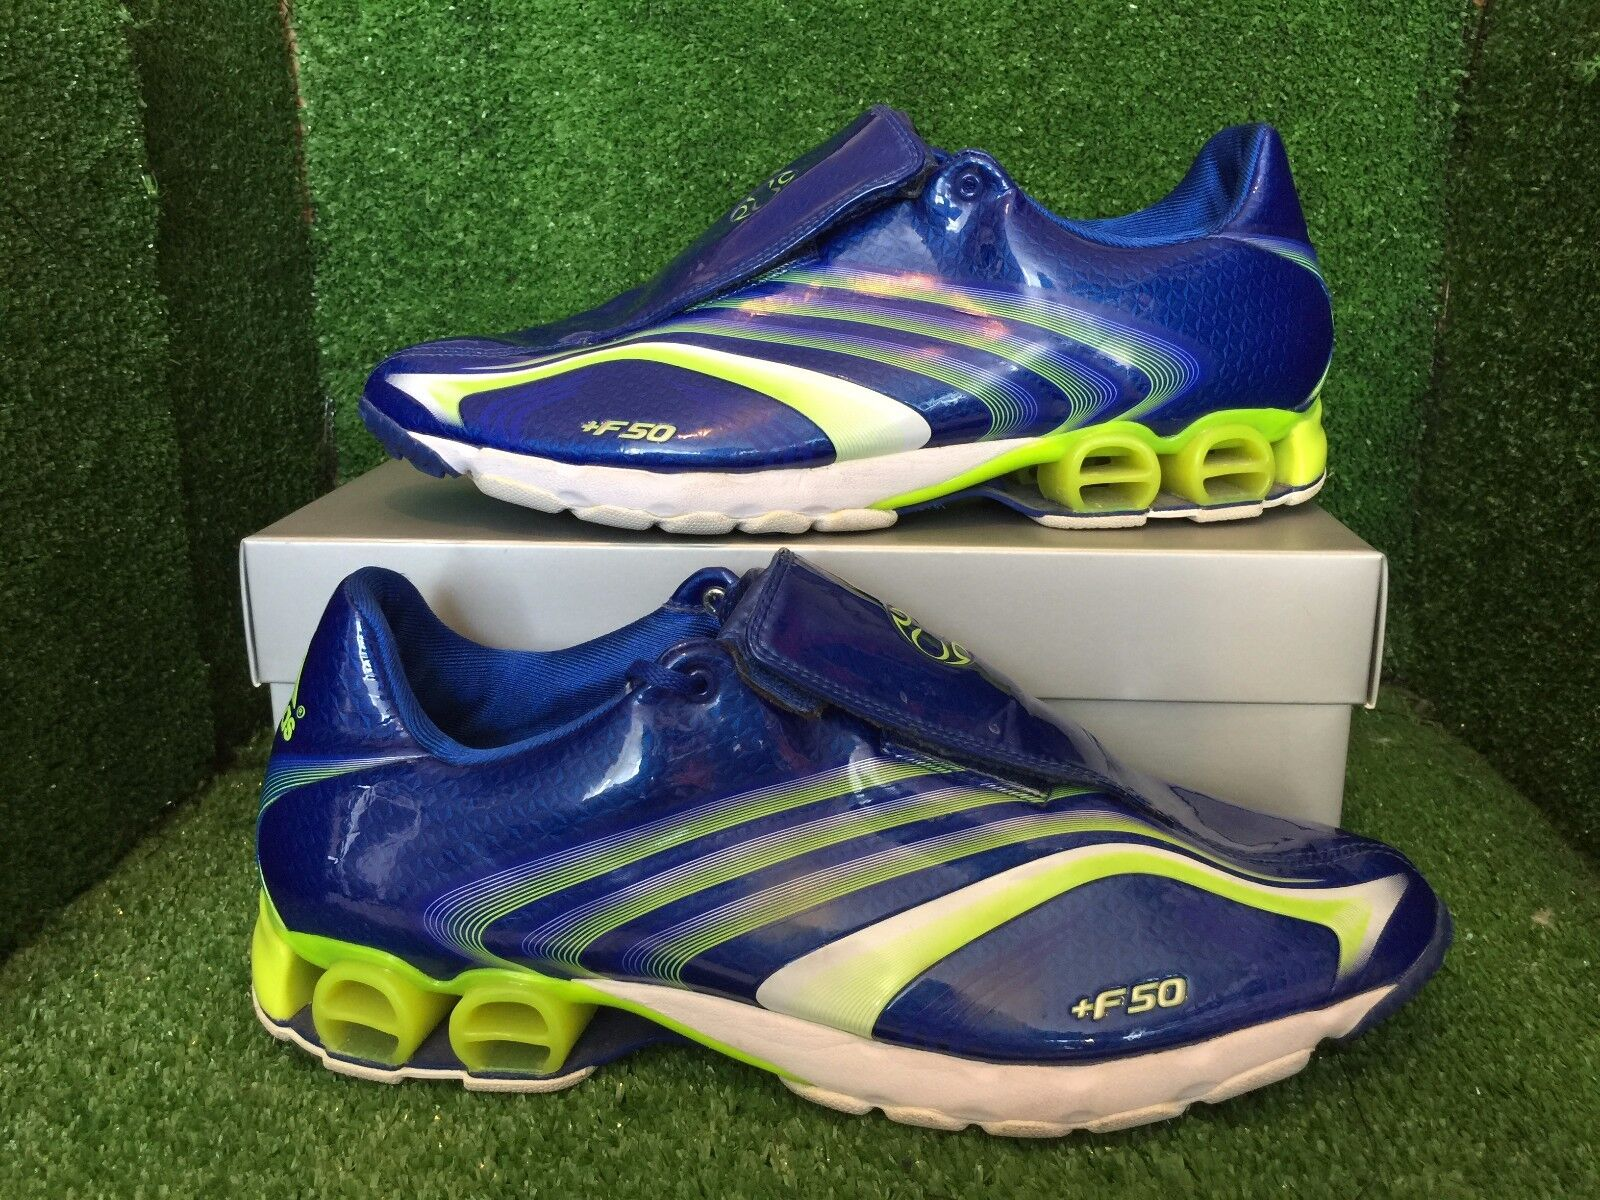 Adidas botas De Interior F50+ Splash Azul Eléctrico